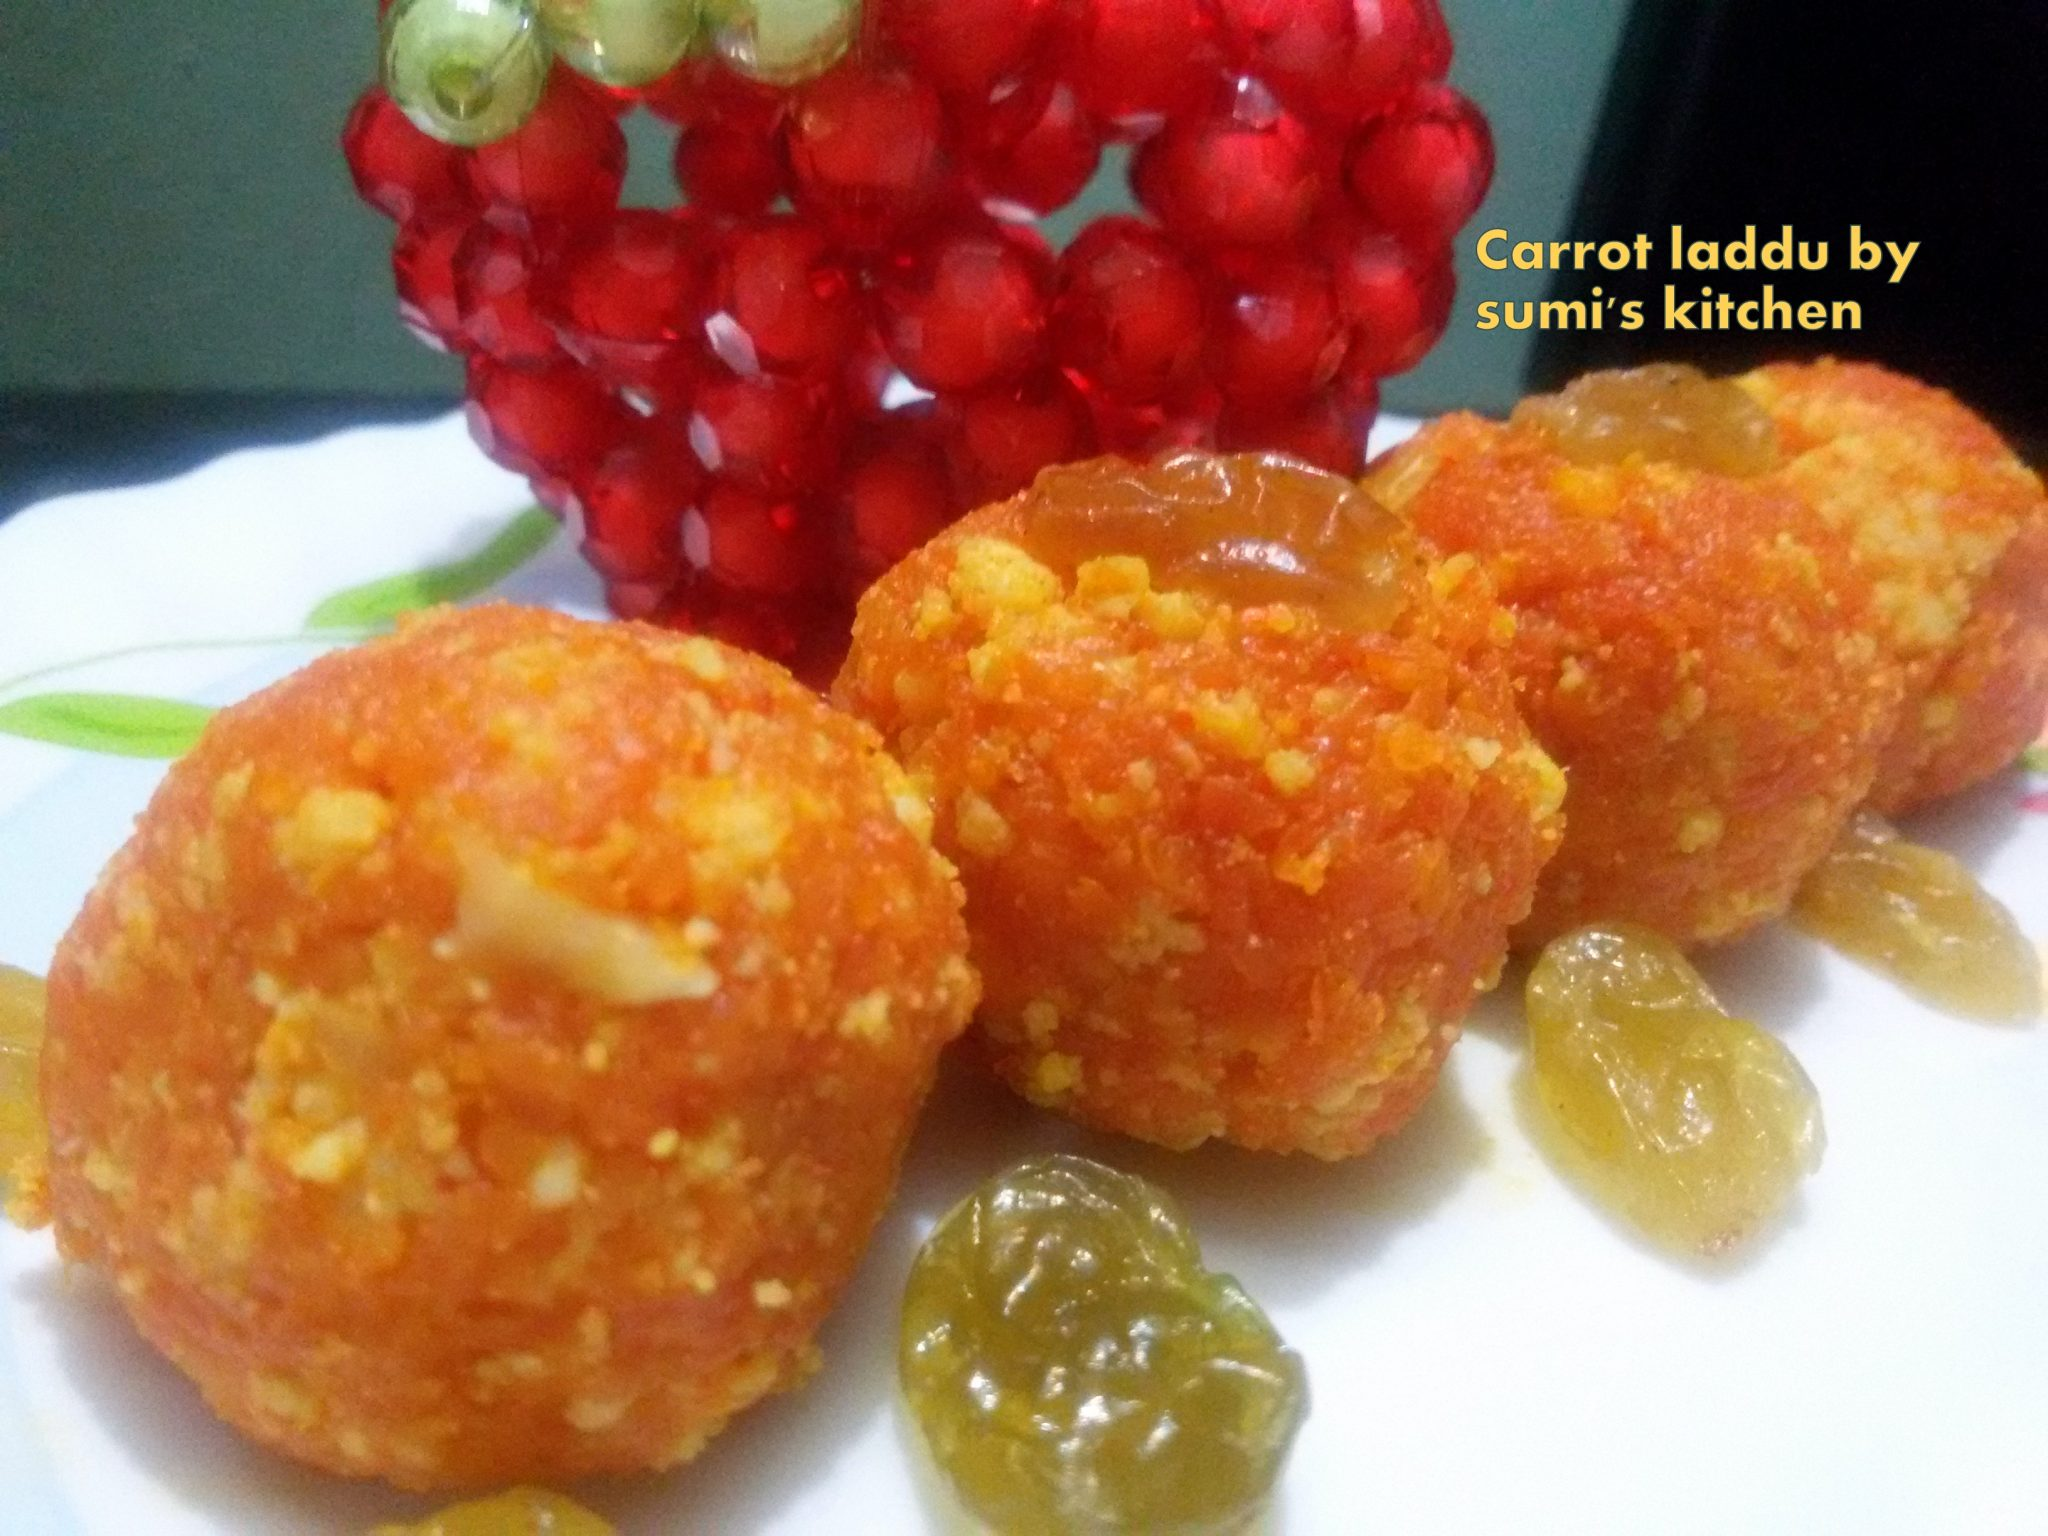 Carrot laddu / halwa